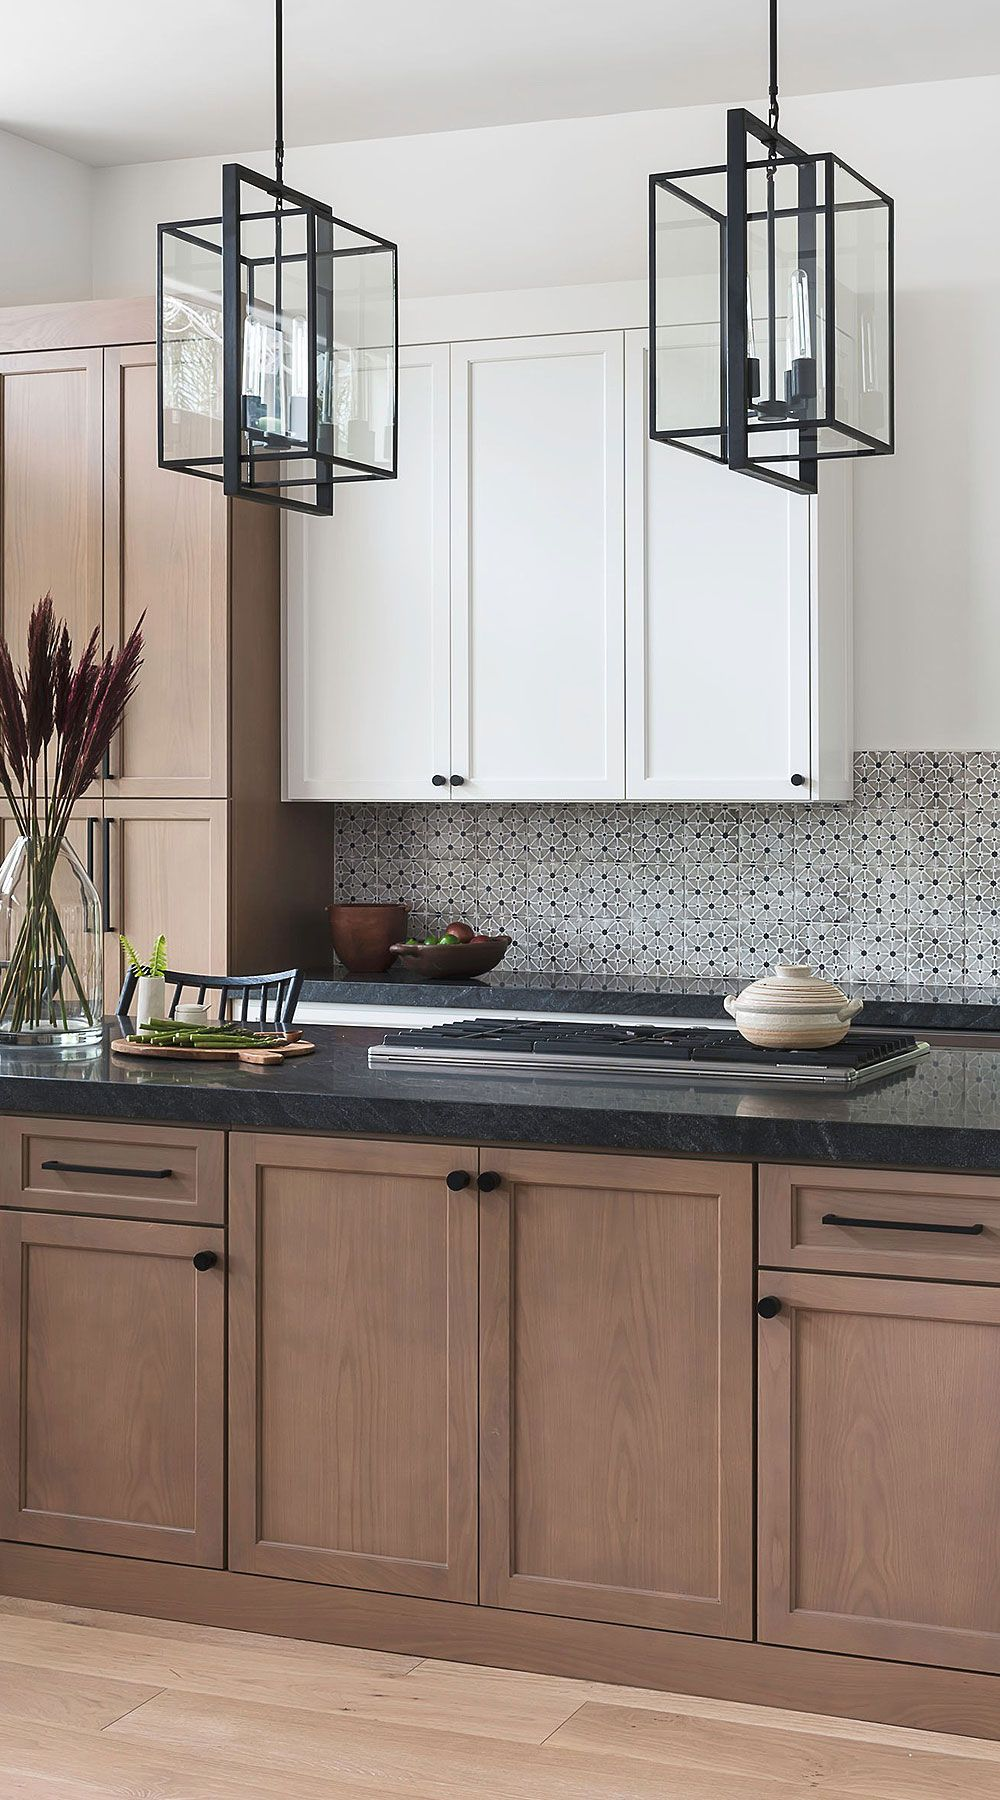 50 black countertop backsplash ideas tile designs tips advice in 2020 black kitchen on kitchen decor black countertop id=93849